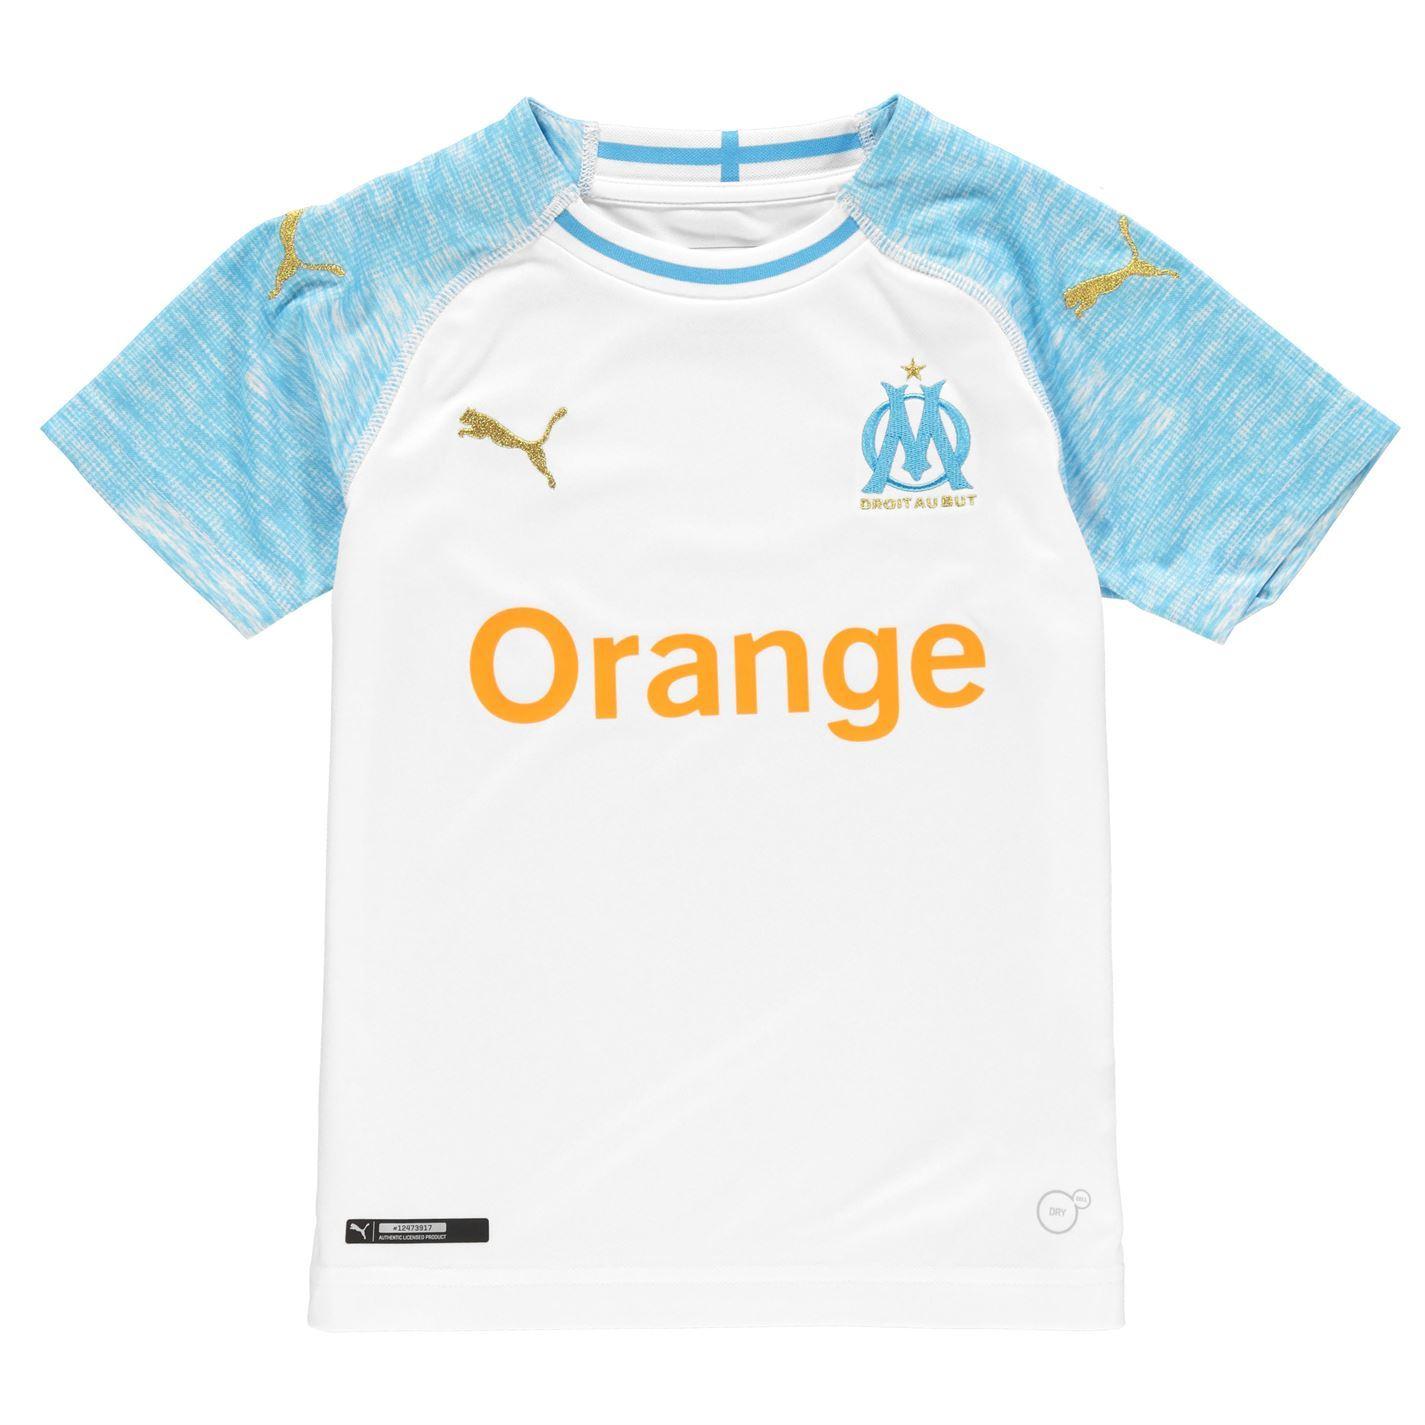 e06aa6aad18 ... Puma Marseille Home Jersey 2018 2019 Juniors White Blue Football Soccer  Shirt ...